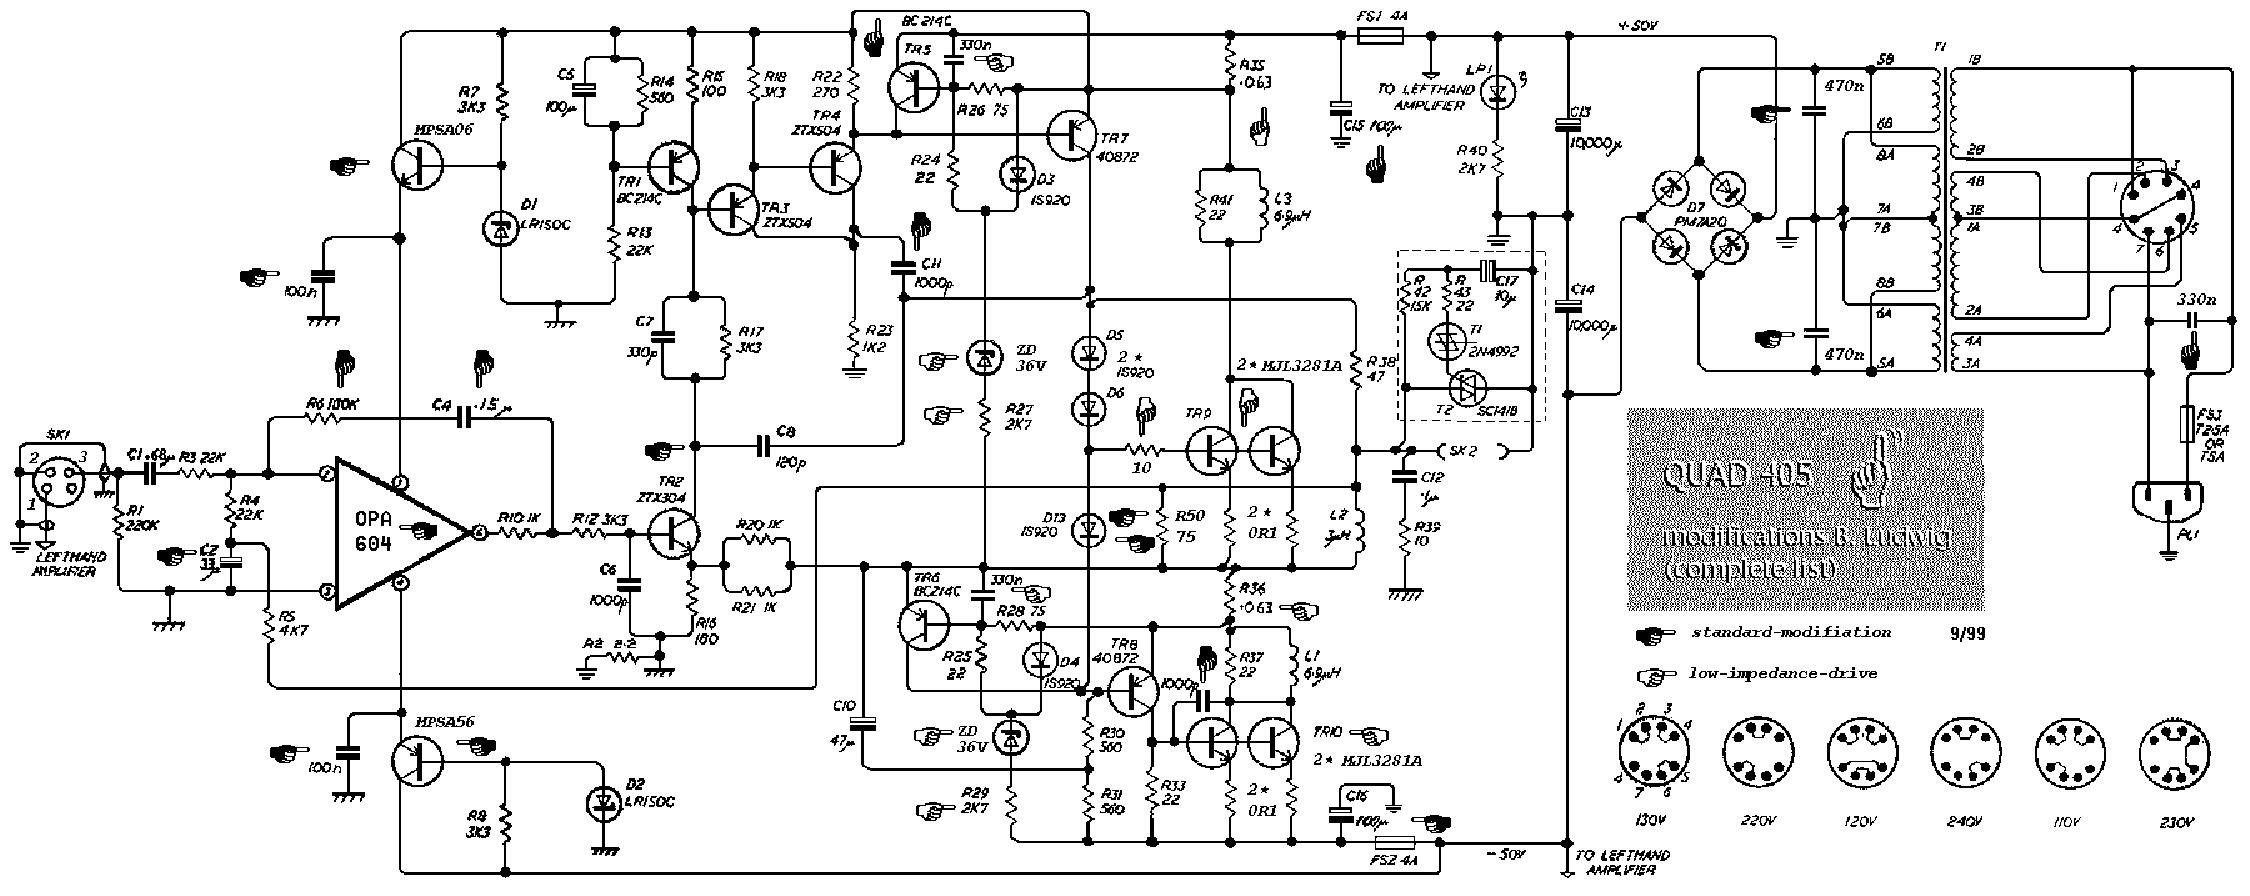 QUAD 405 SCH Service Manual download, schematics, eeprom ... Quad Schematic on